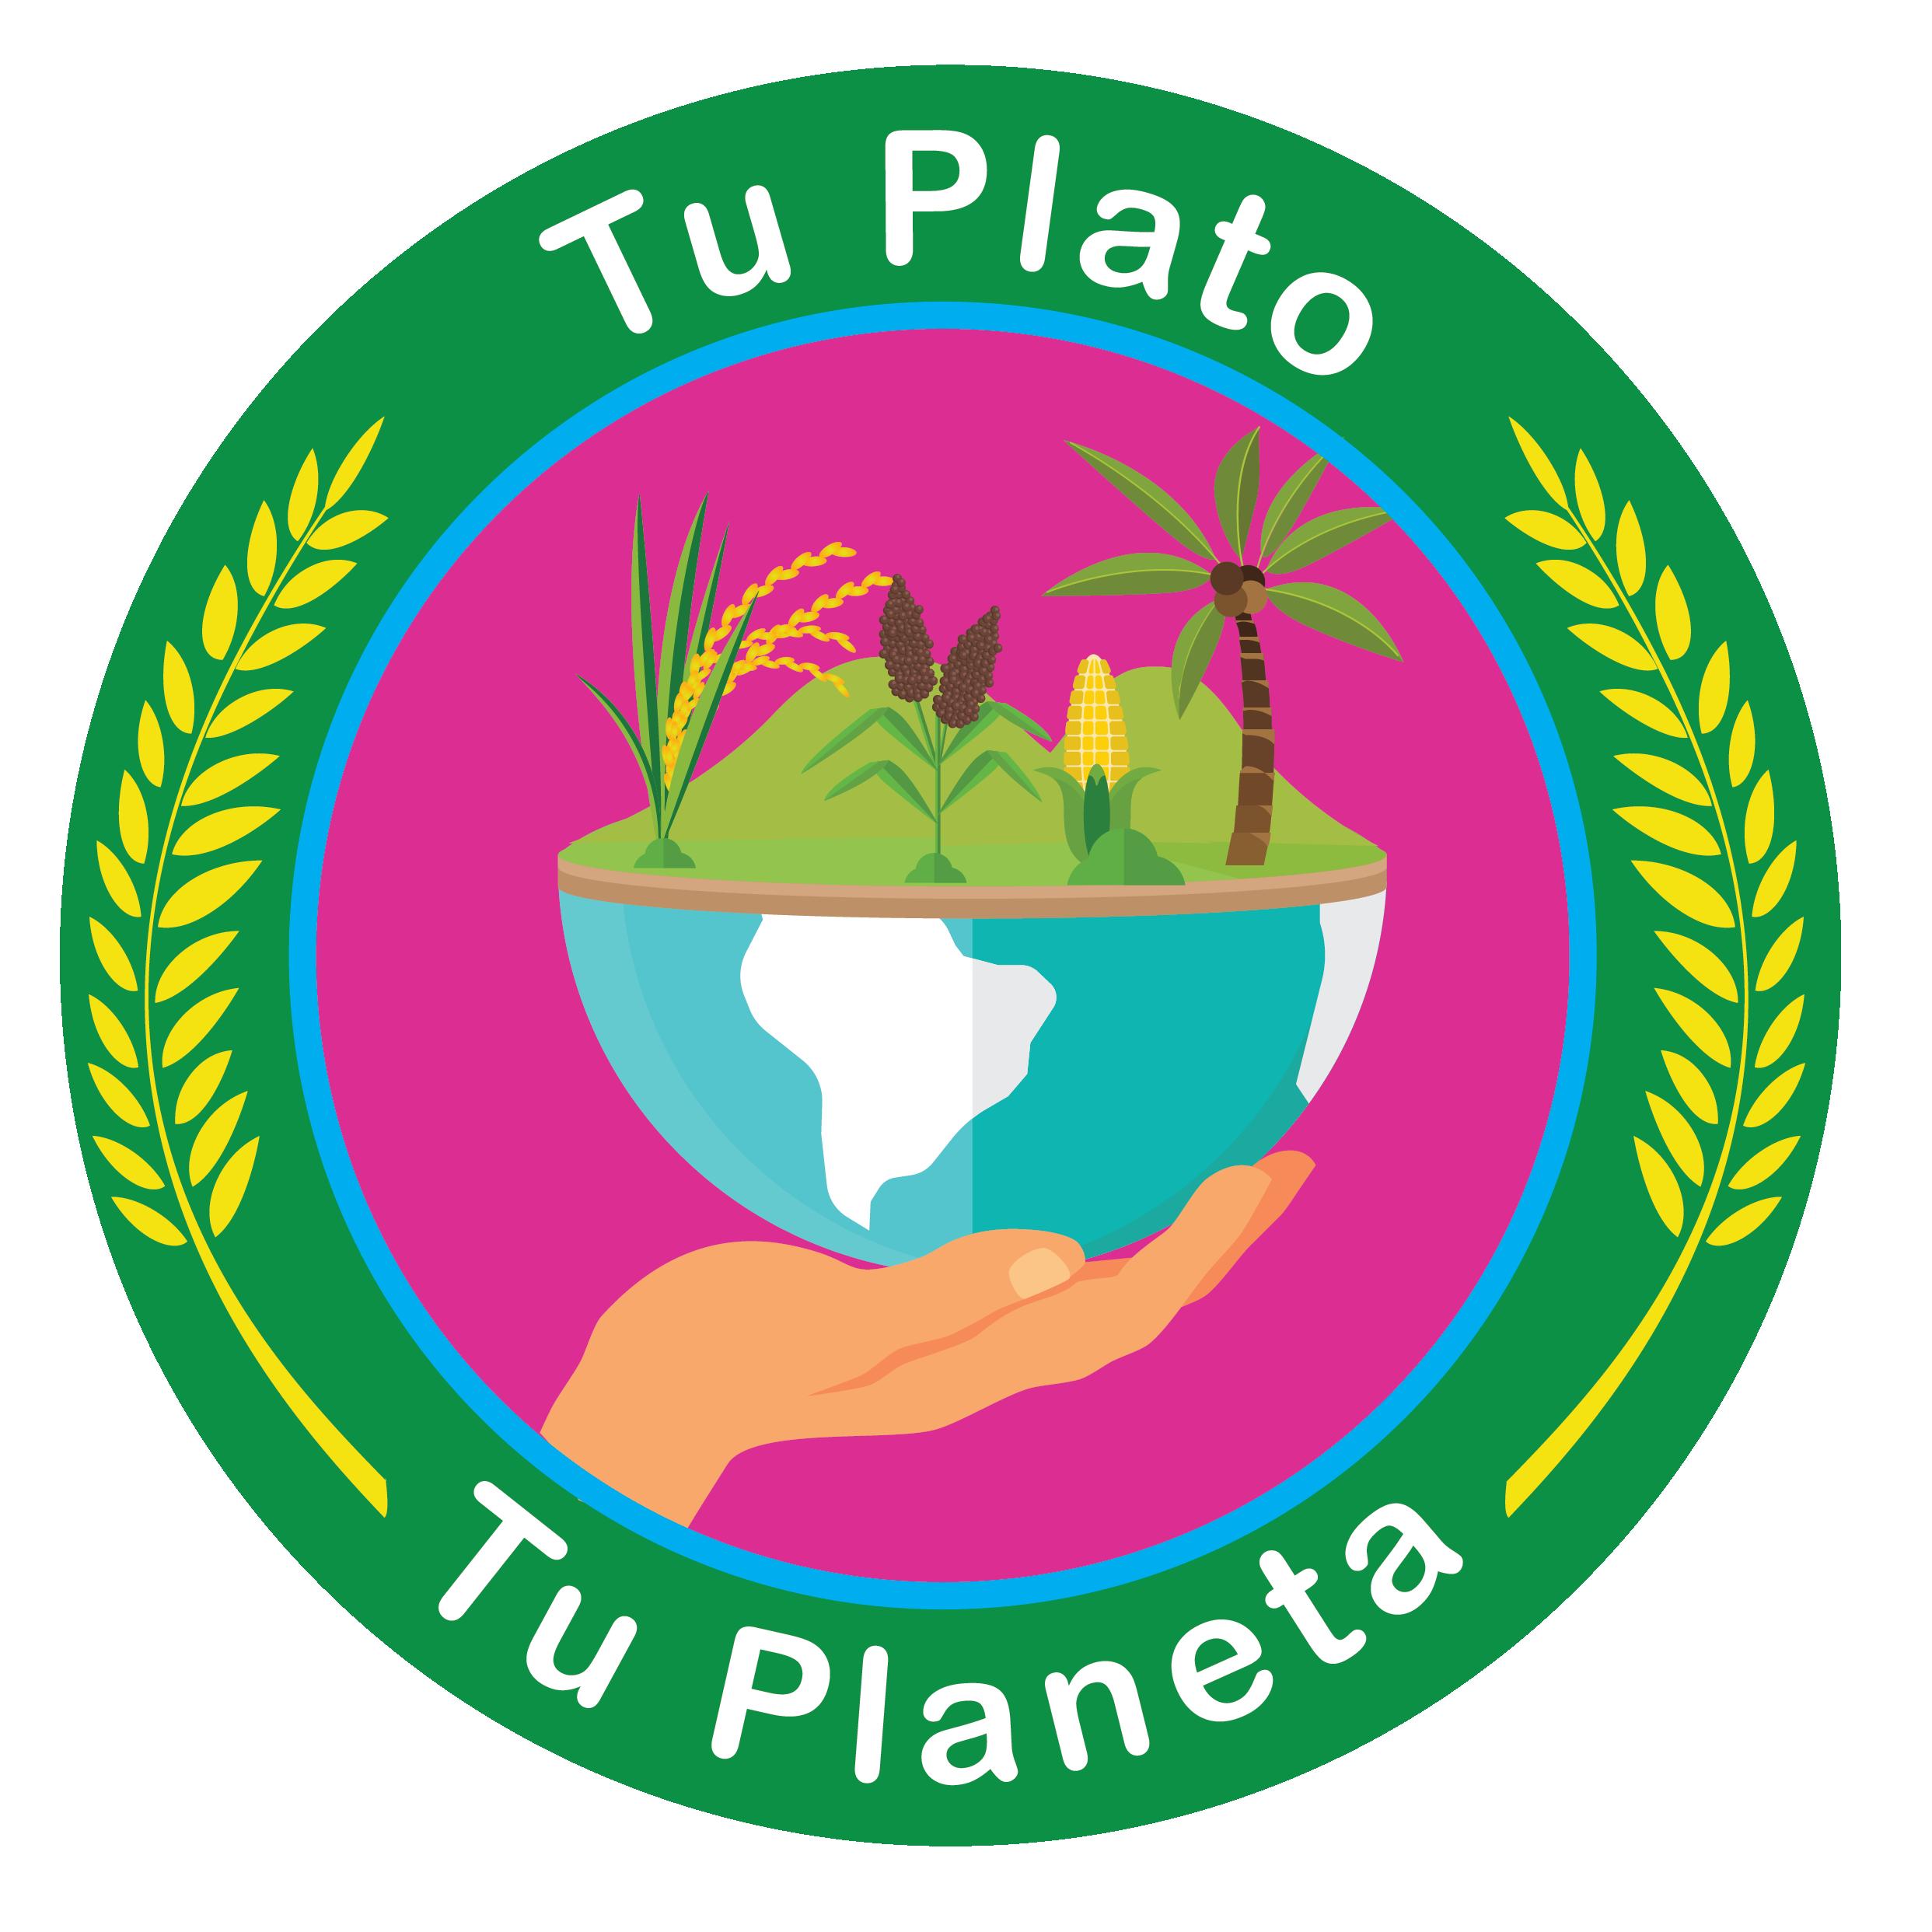 Logo-Planeta-Plato-FINAL (1)